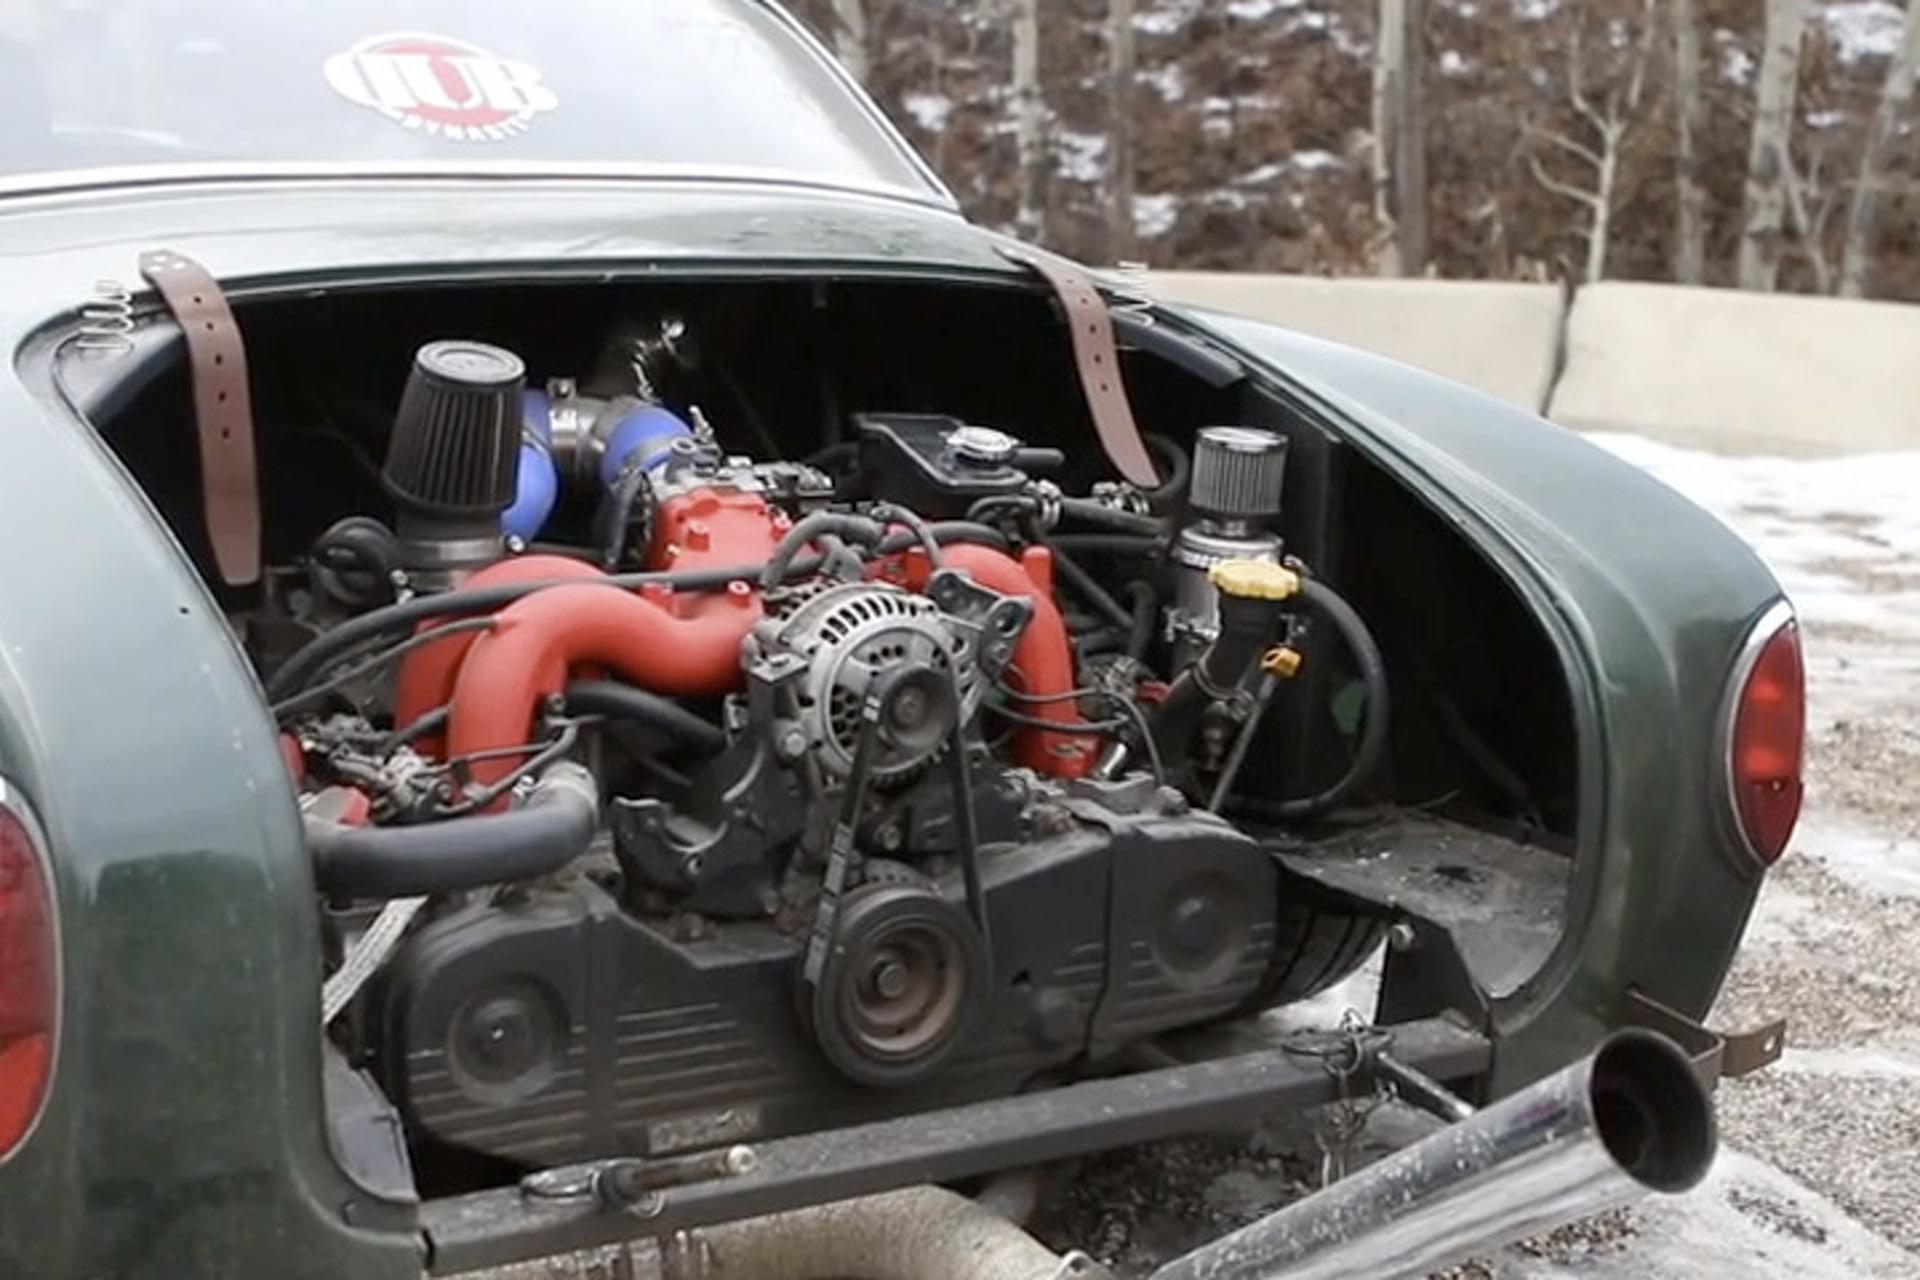 Subaru Swapped Karmann Ghia Is One Cool Daily Driver